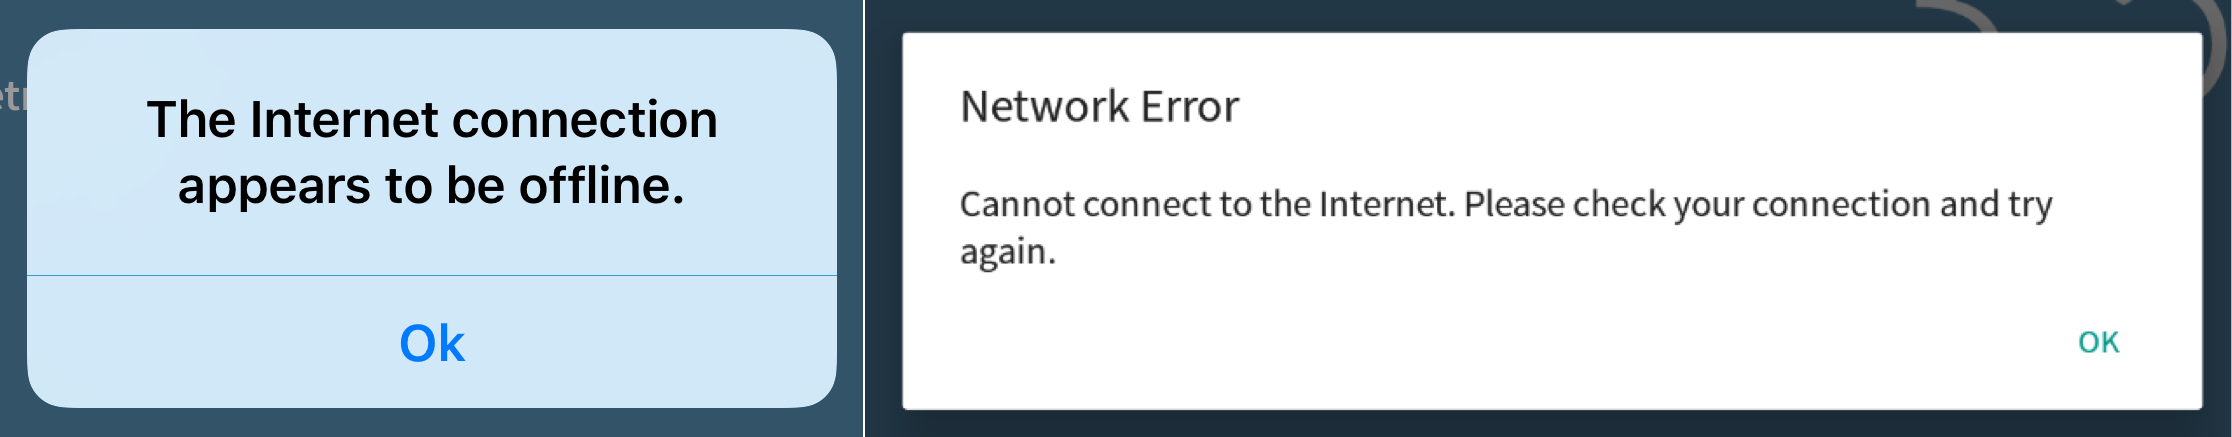 Network errors